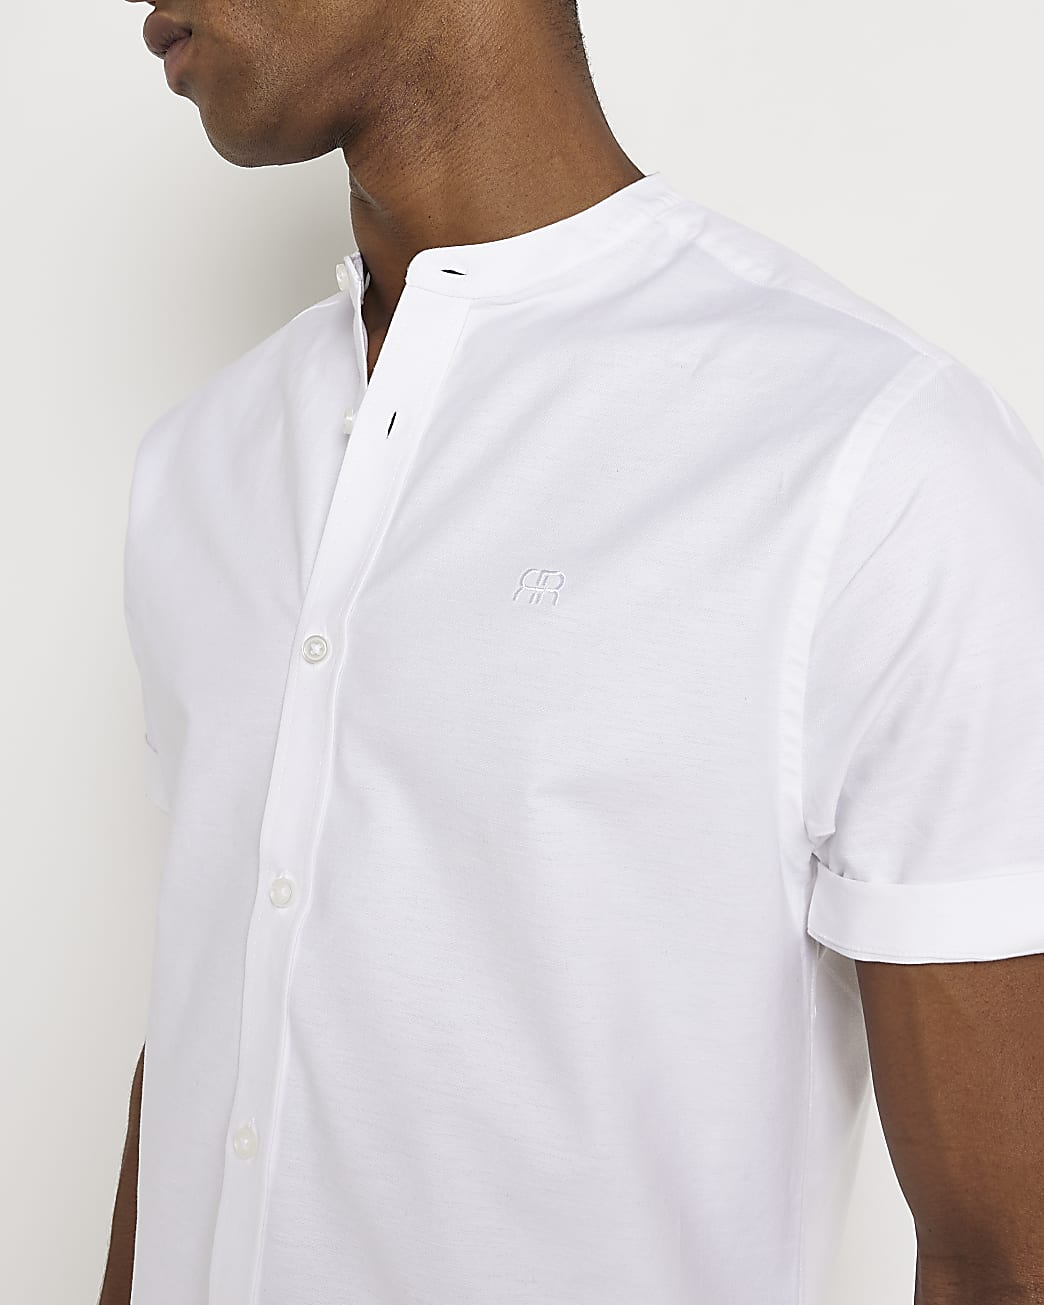 White slim fit short sleeve Oxford shirt